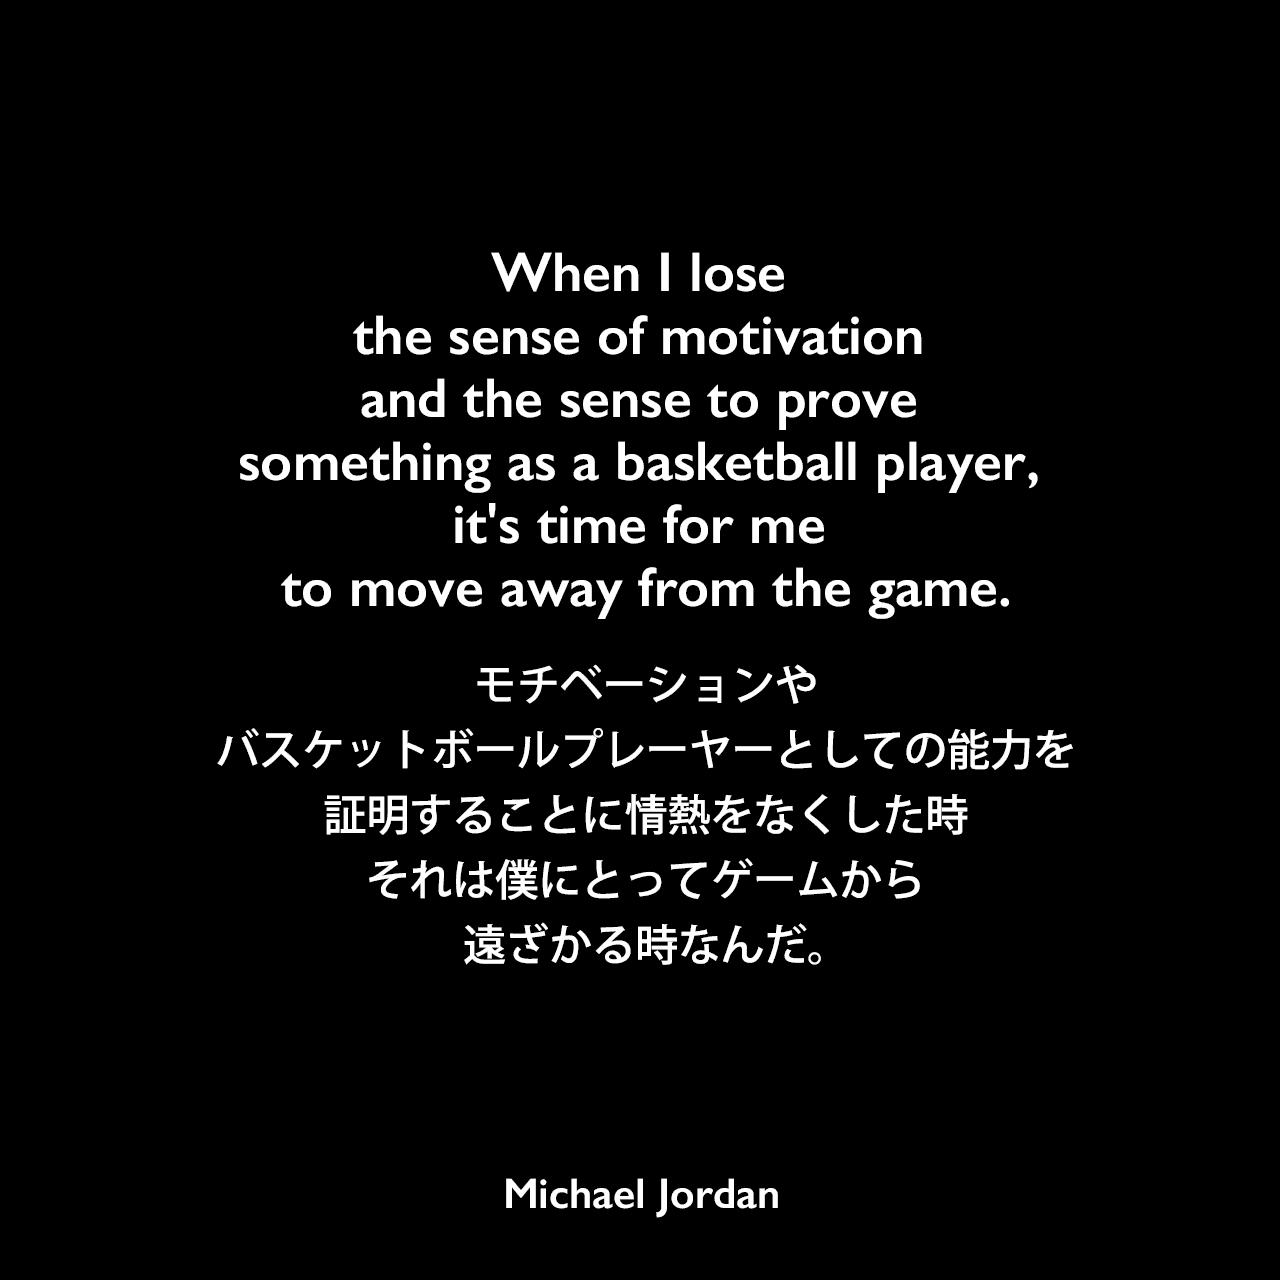 When I lose the sense of motivation and the sense to prove something as a basketball player, it's time for me to move away from the game.モチベーションやバスケットボールプレーヤーとしての能力を証明することに情熱をなくした時、それは僕にとってゲームから遠ざかる時なんだ。Michael Jordan